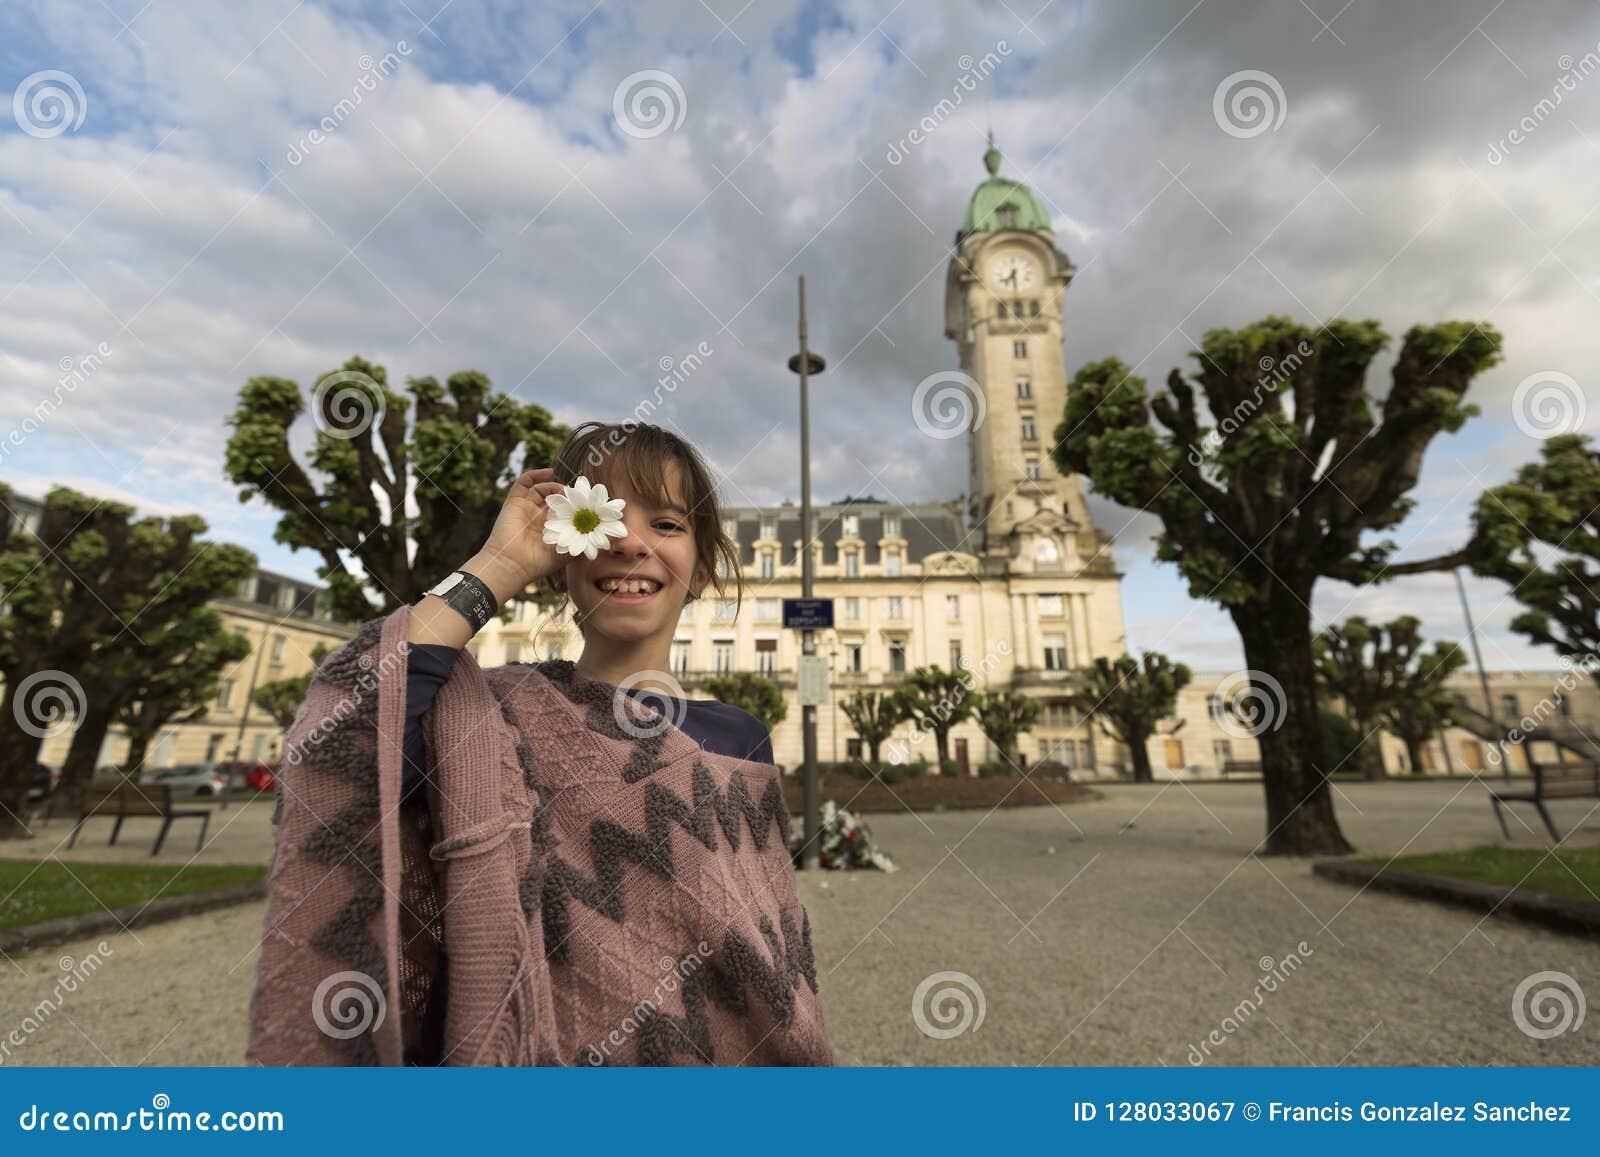 11-jährige Spanierin vor dem Limoges